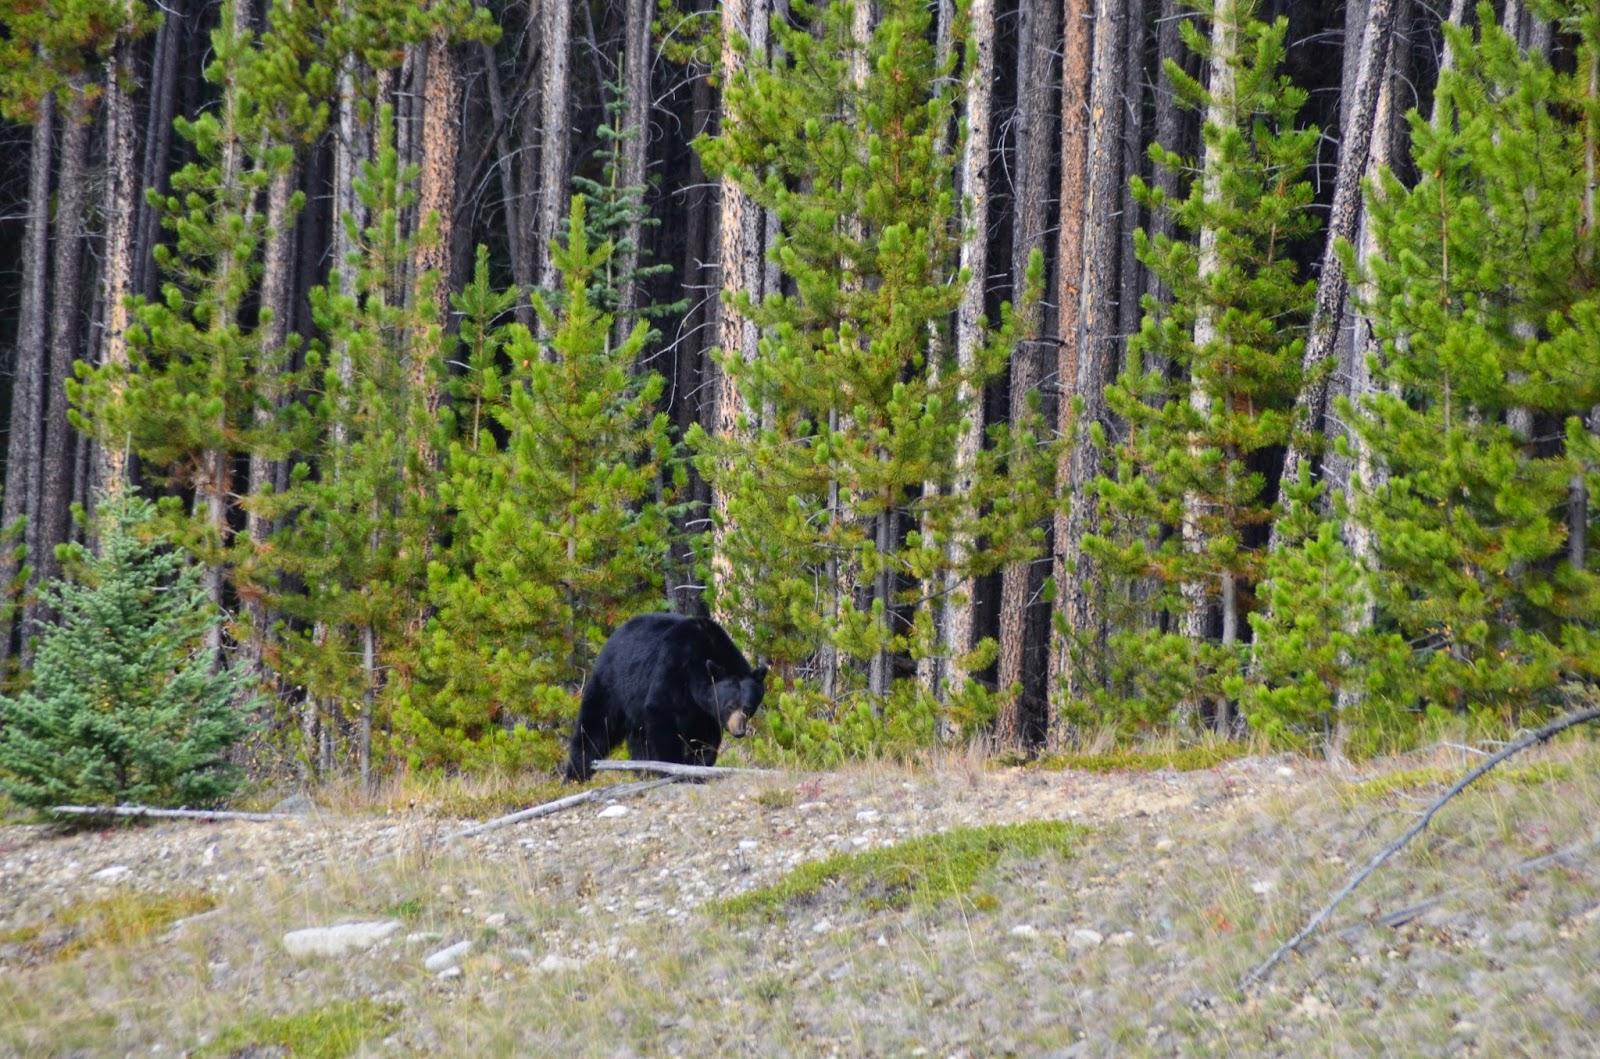 Parque Nacional de Banff, Canadá